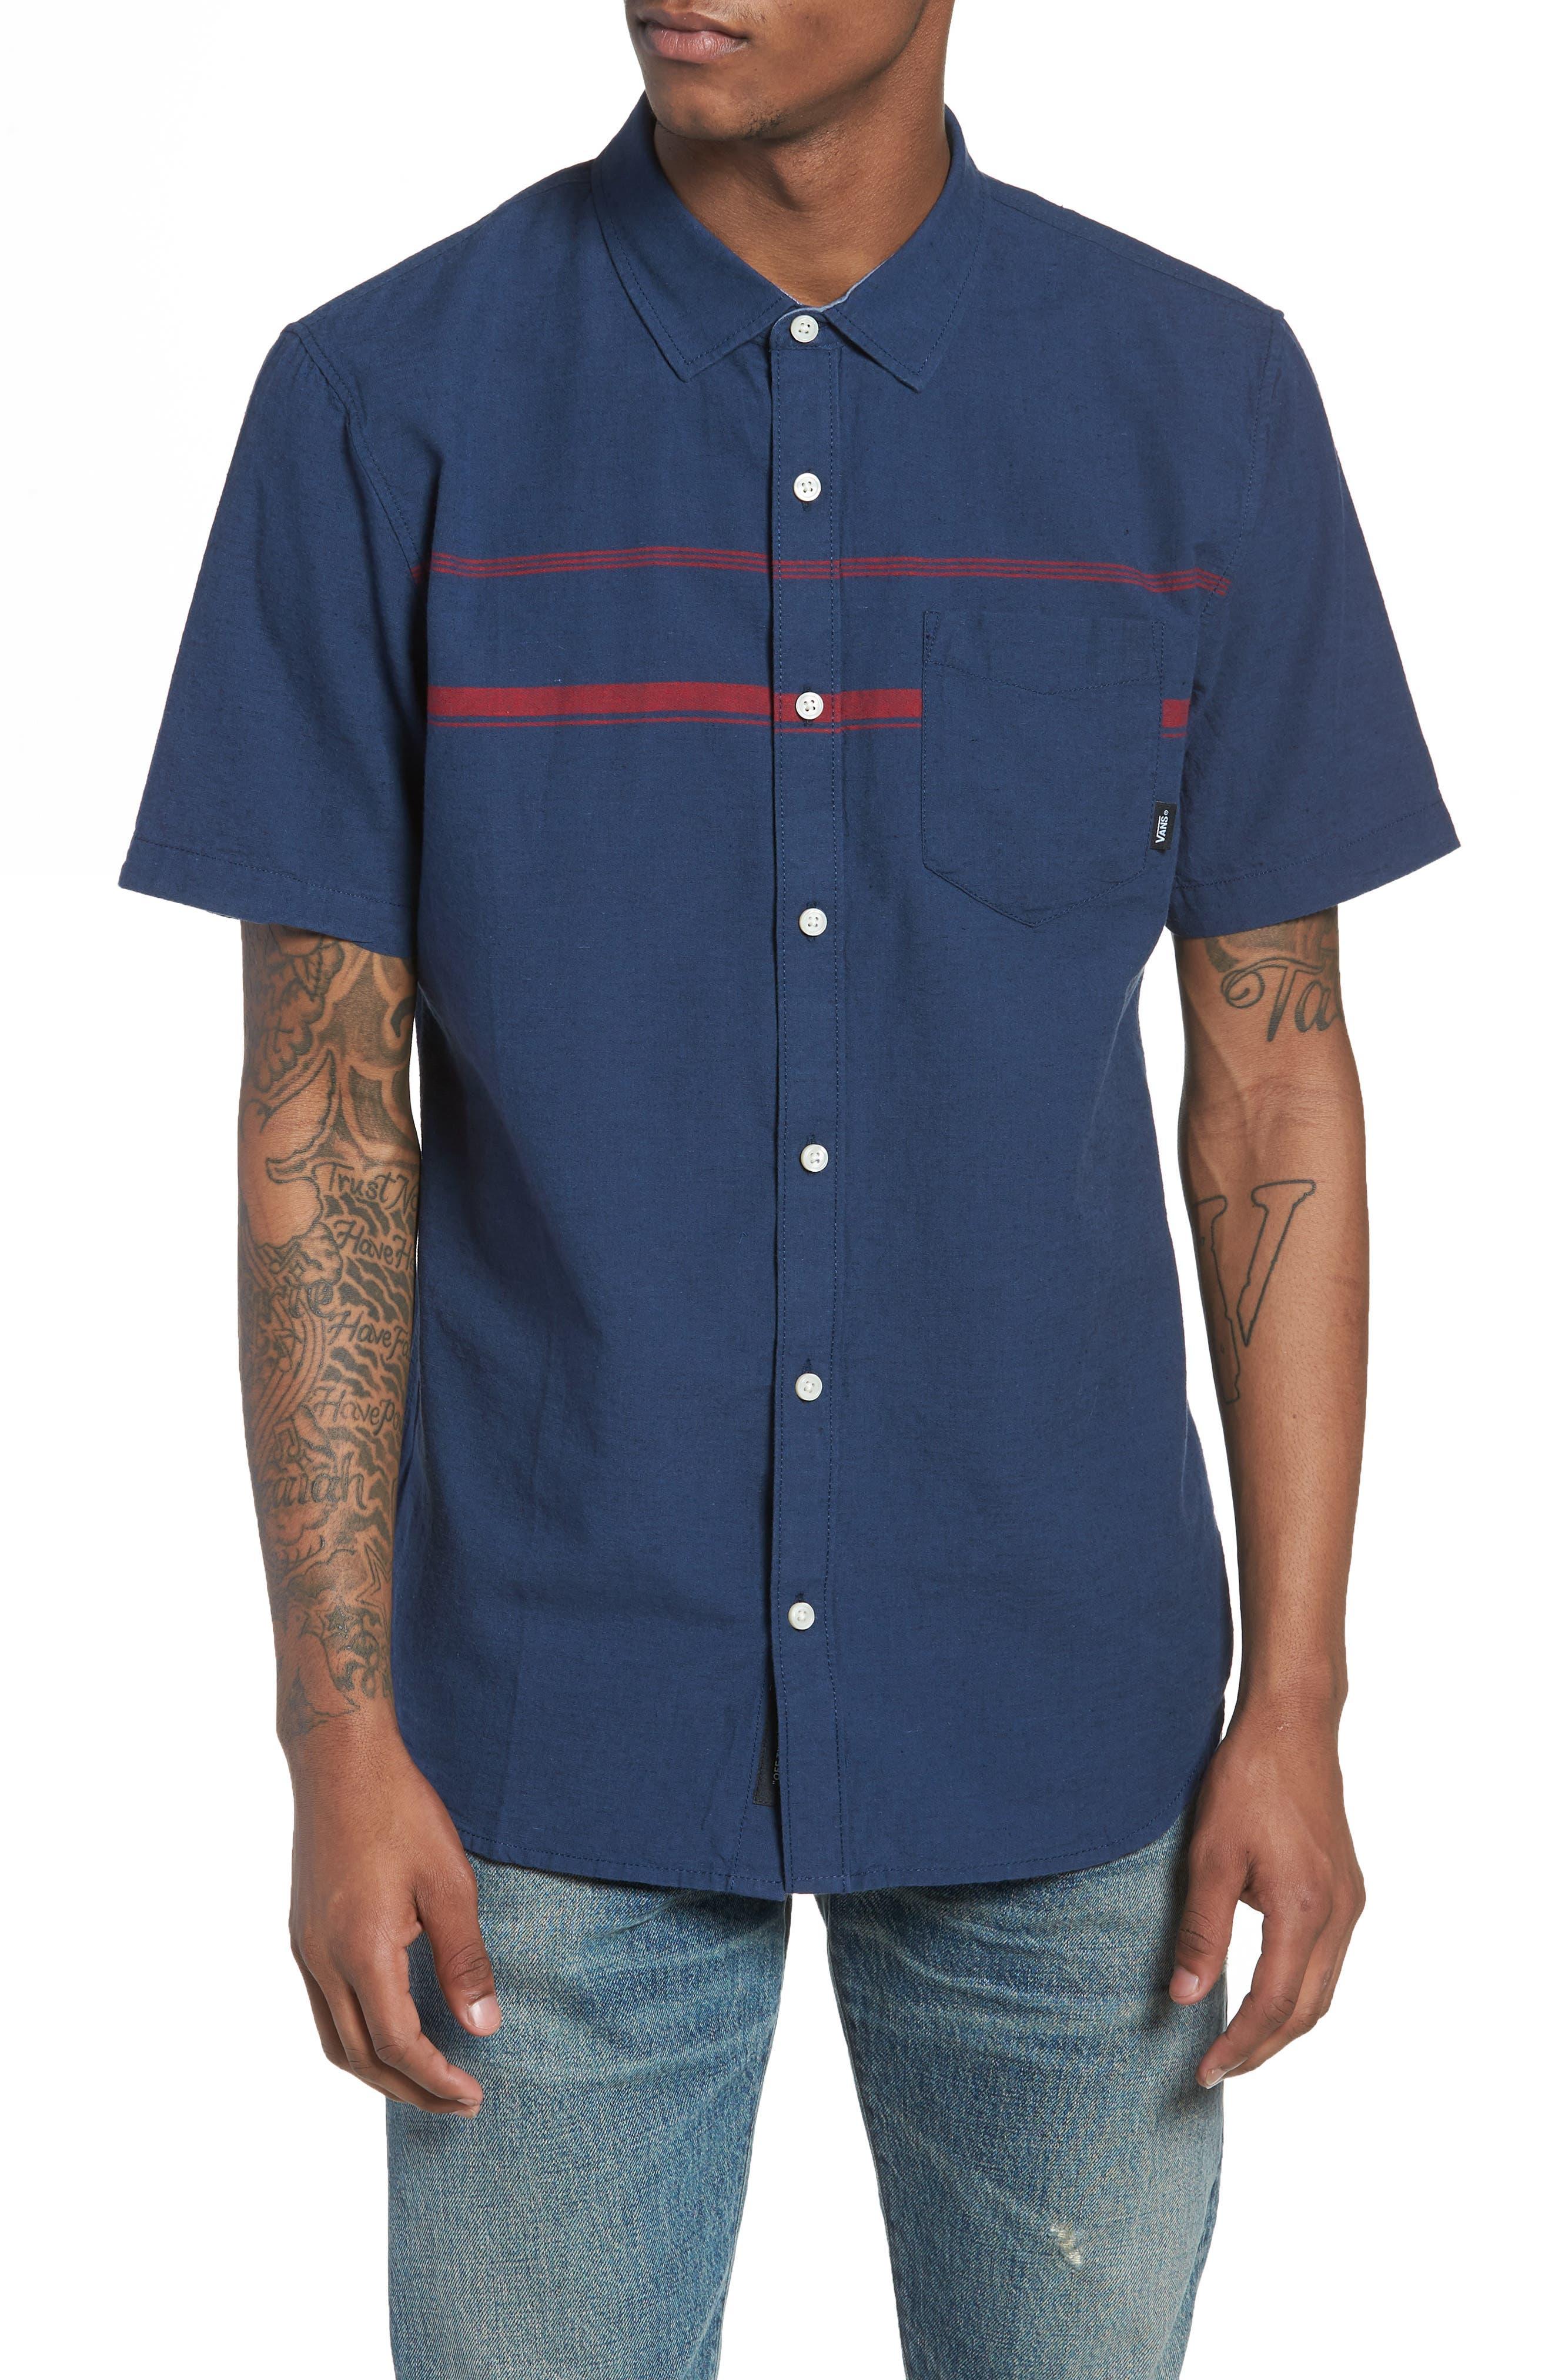 Thurber Short Sleeve Shirt,                             Main thumbnail 1, color,                             401